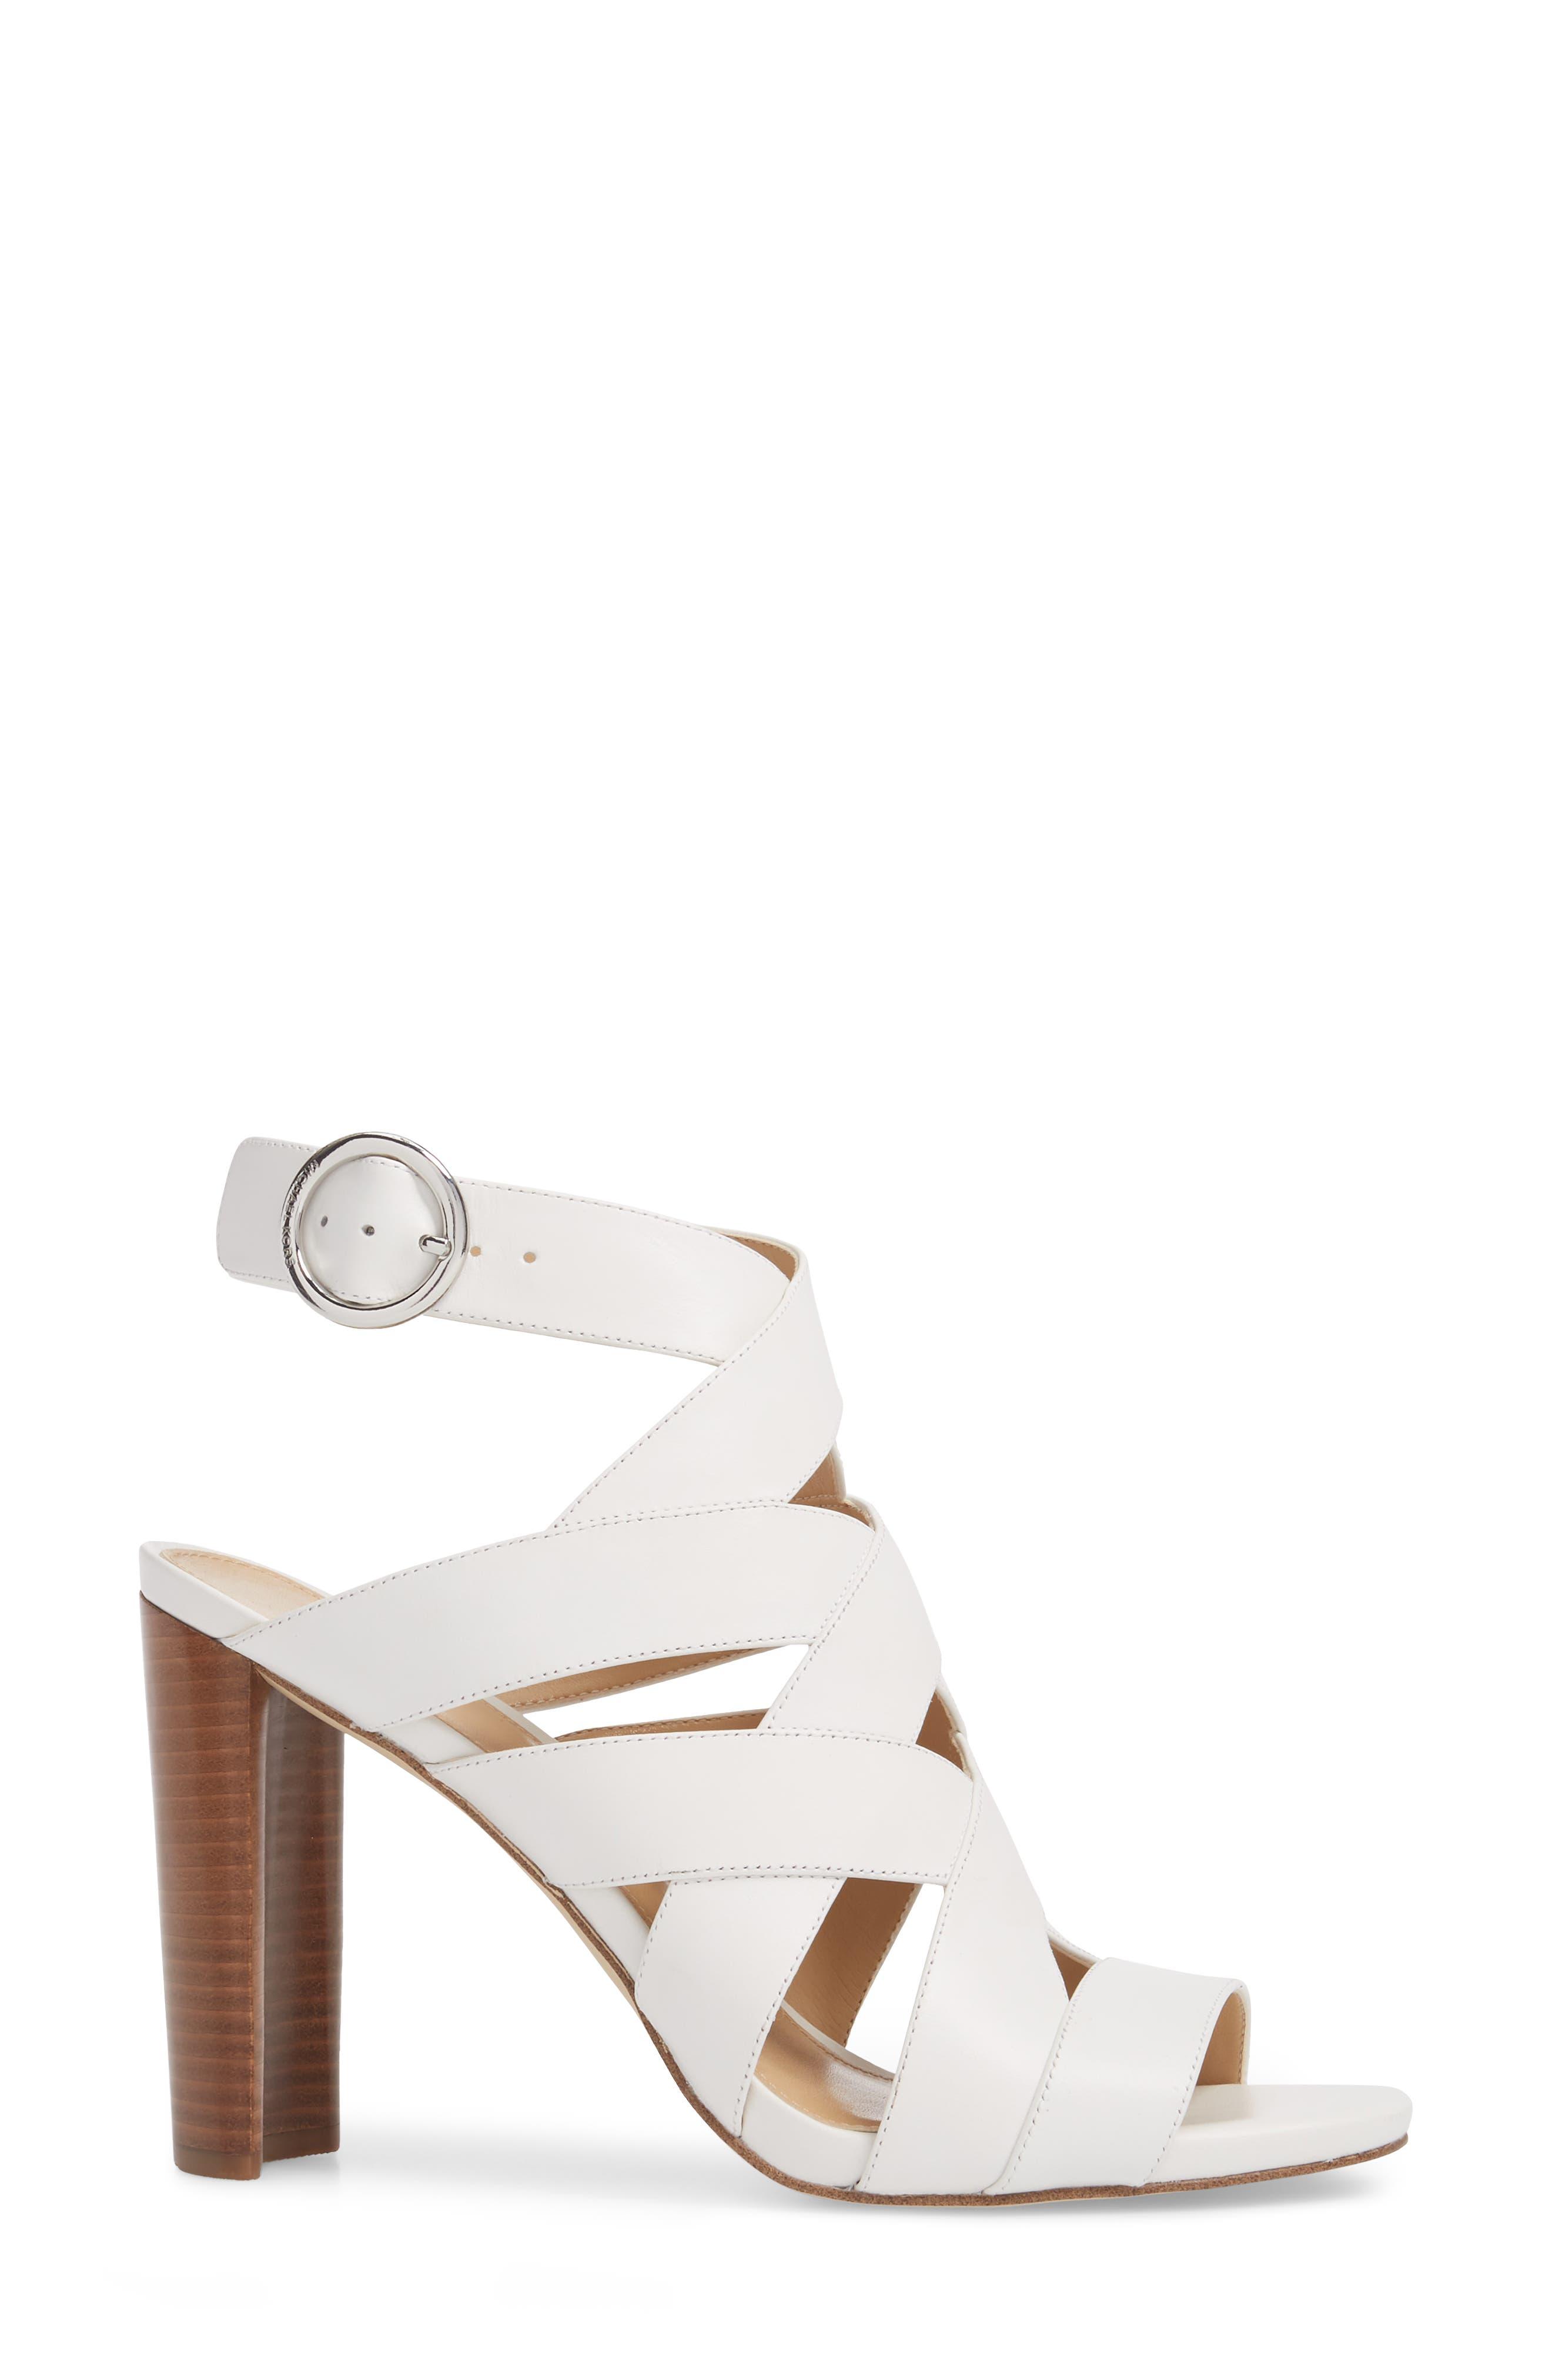 Alana Sandal,                             Alternate thumbnail 3, color,                             Optic White Leather